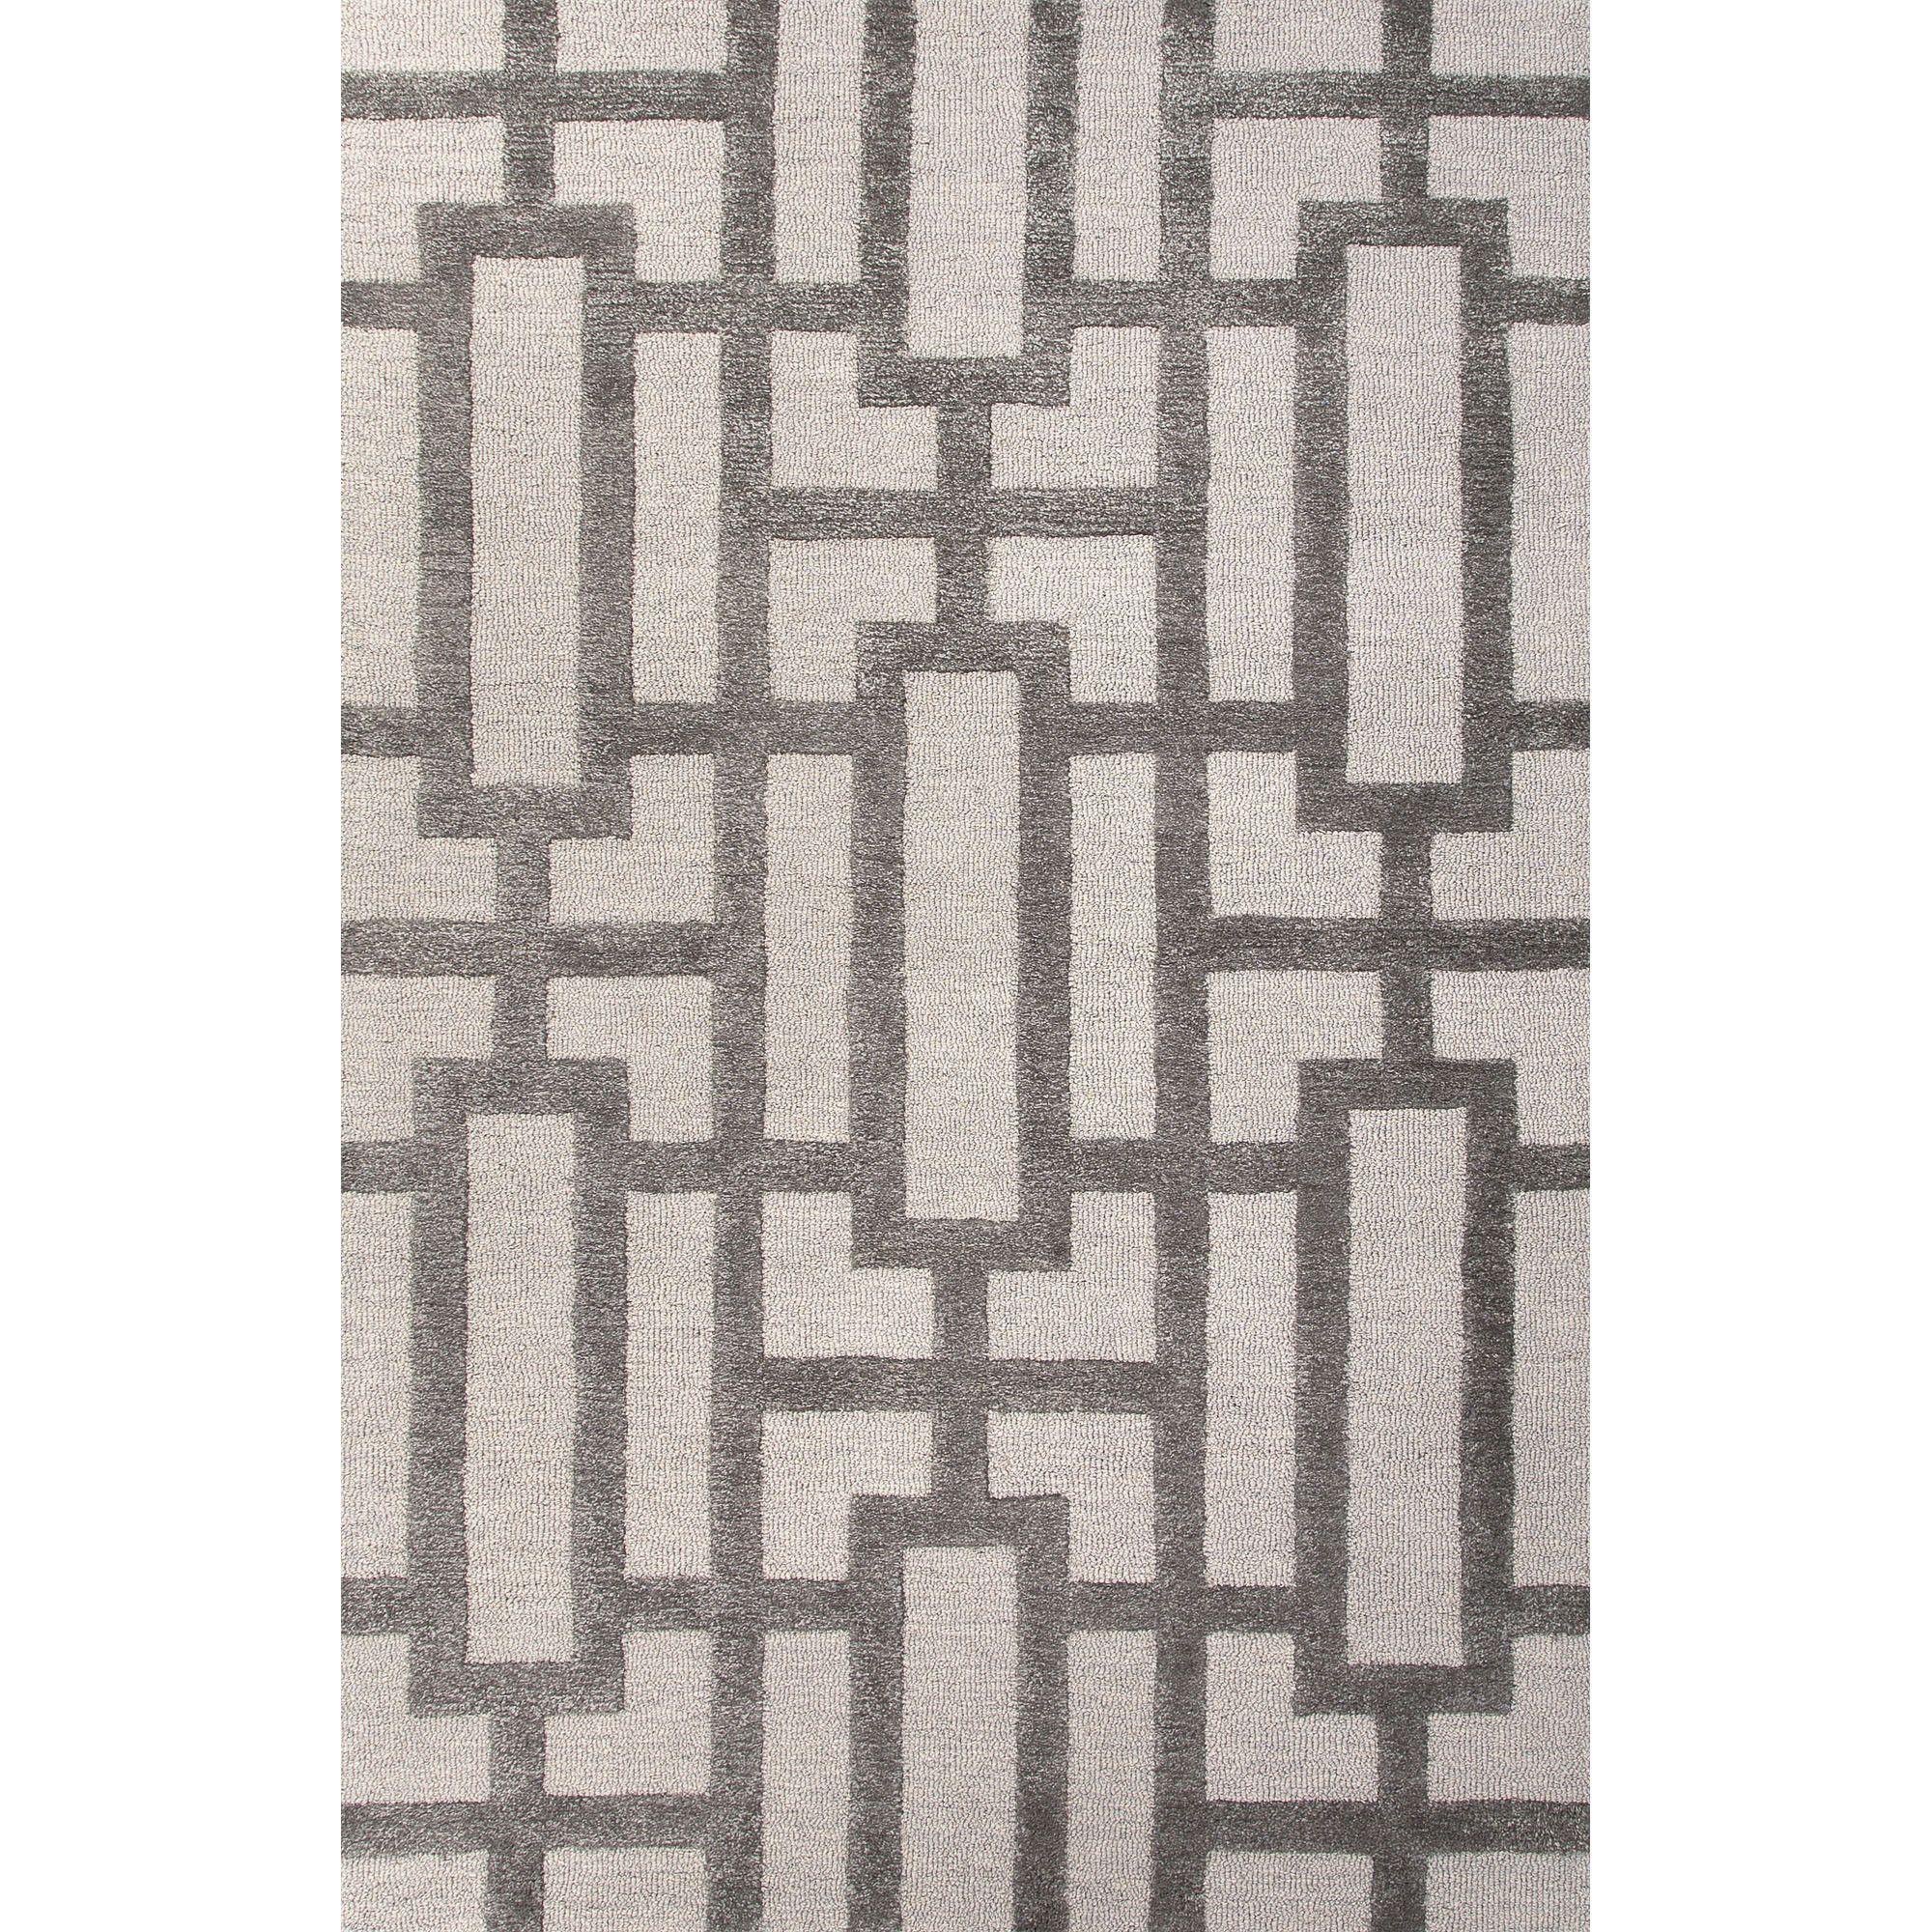 Jaipur Rugs Modern Geometric Pattern Ivory Gray Wool And Art Silk Area Rug Ct36